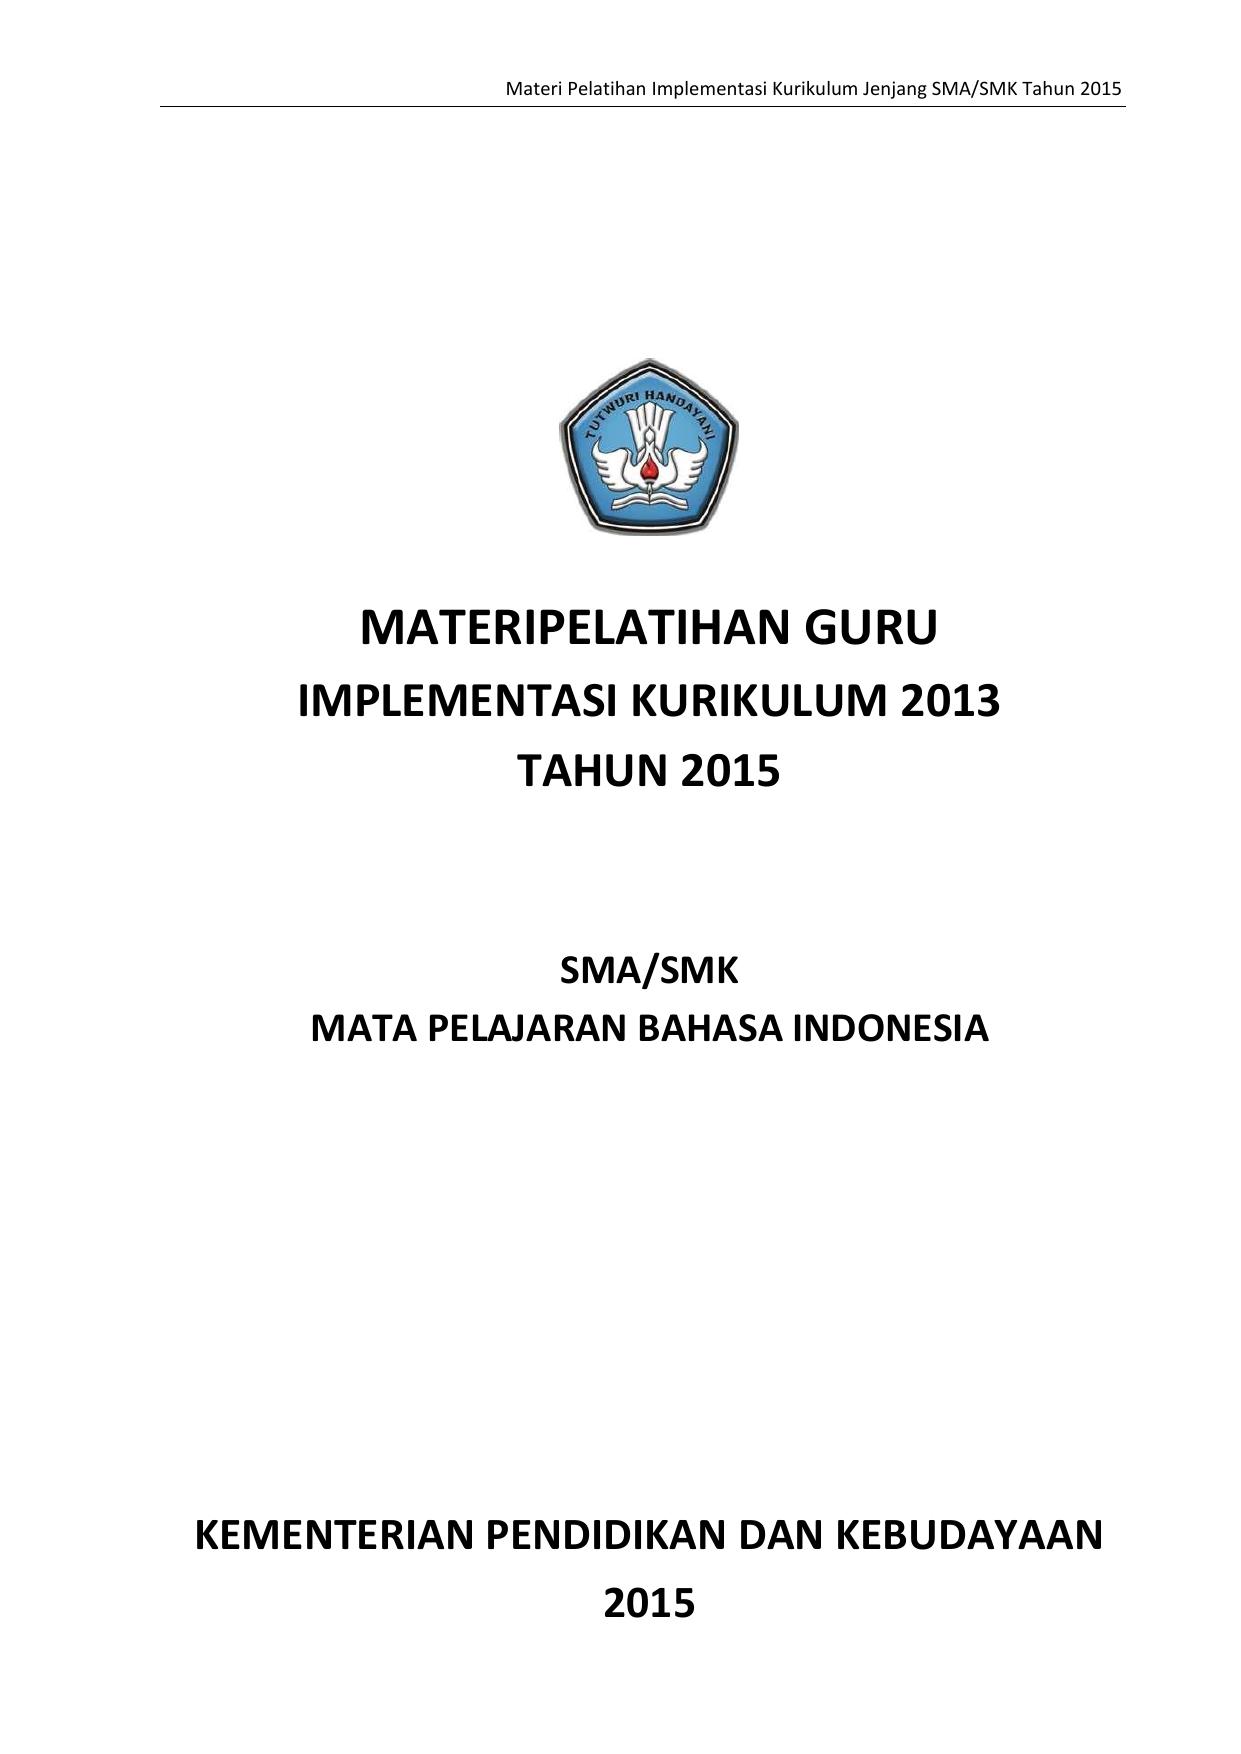 Materipelatihan Guru Mgmp Bahasa Indonesia Smk